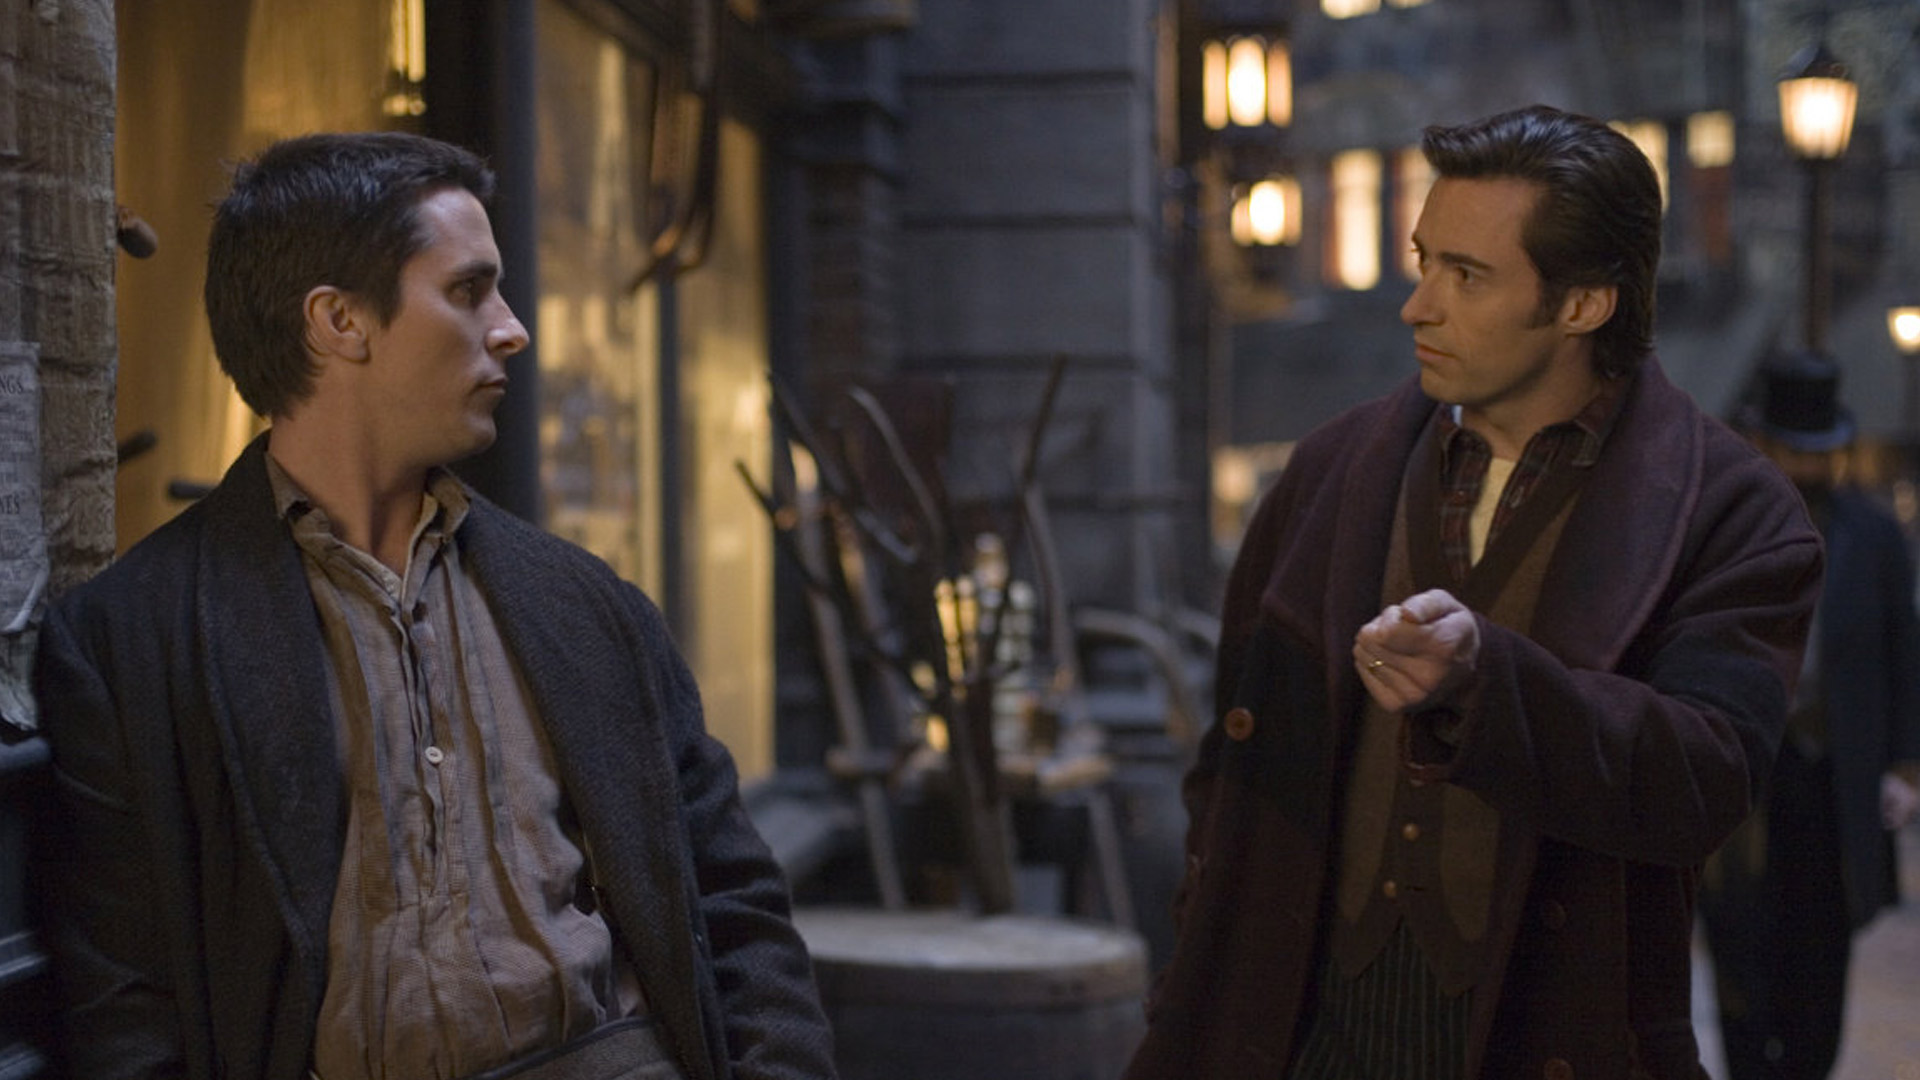 Amazon.com: The Prestige: Hugh Jackman, Christian Bale, Michael Caine,  Scarlett Johansson